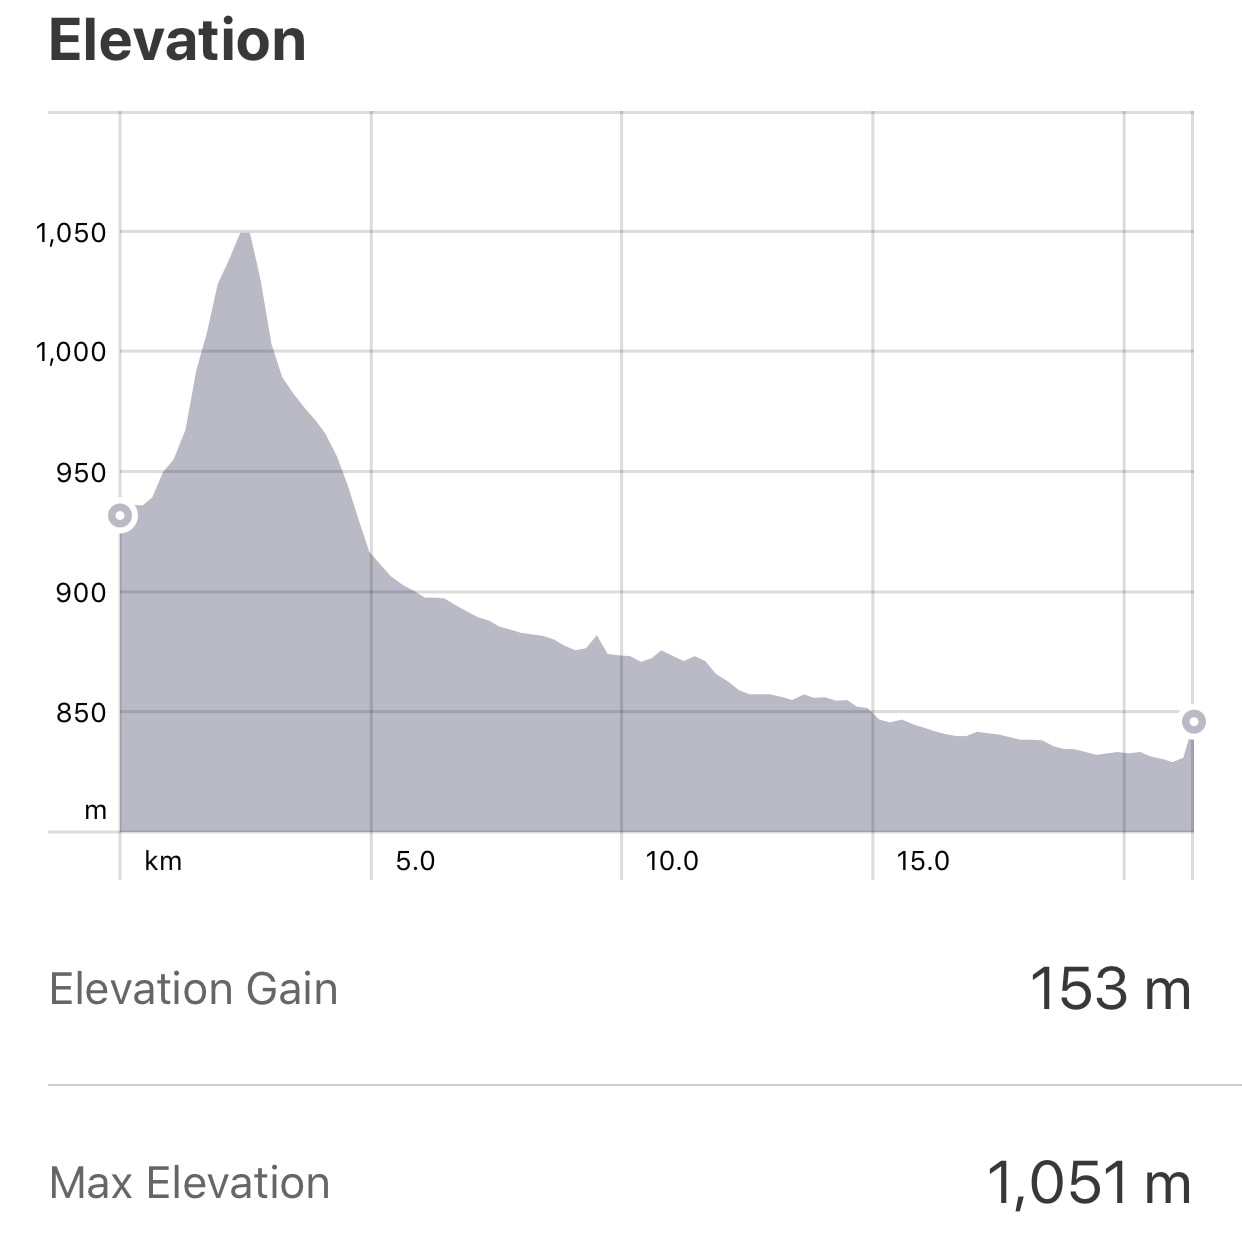 Strava: Atapuerca to Burgos Elevation